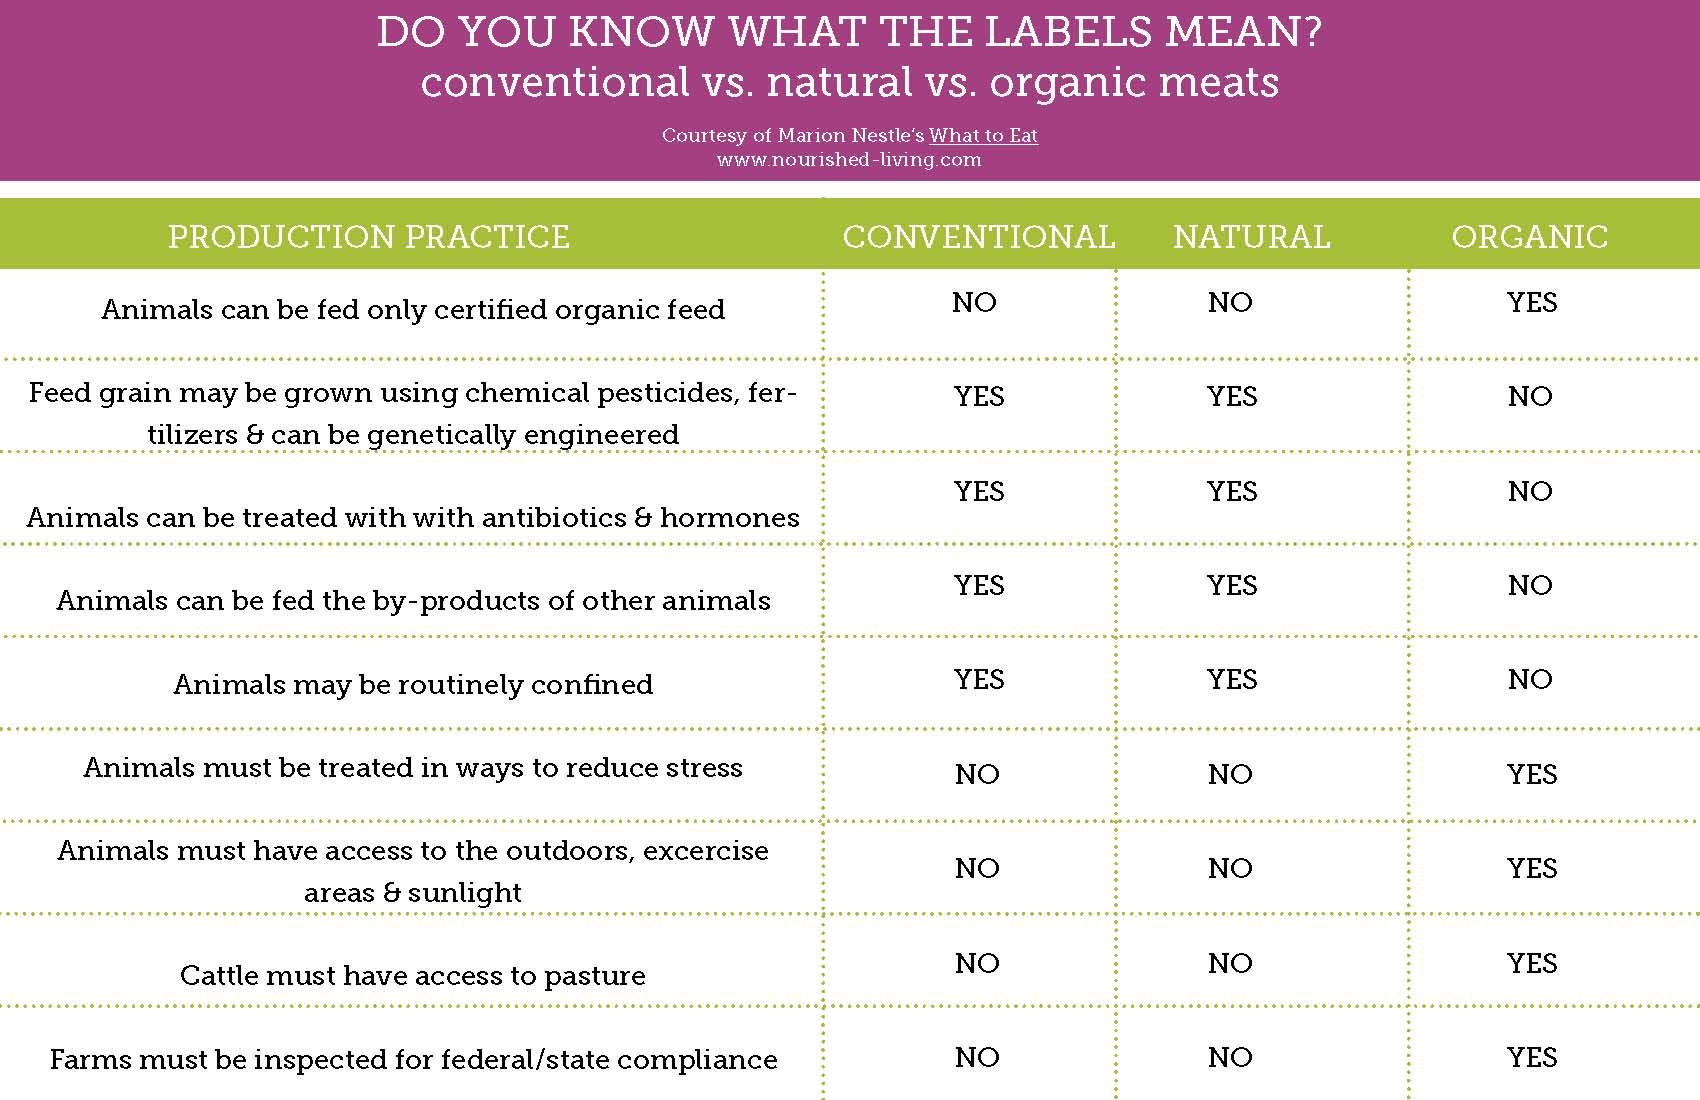 organic vs natural vs conventional meats